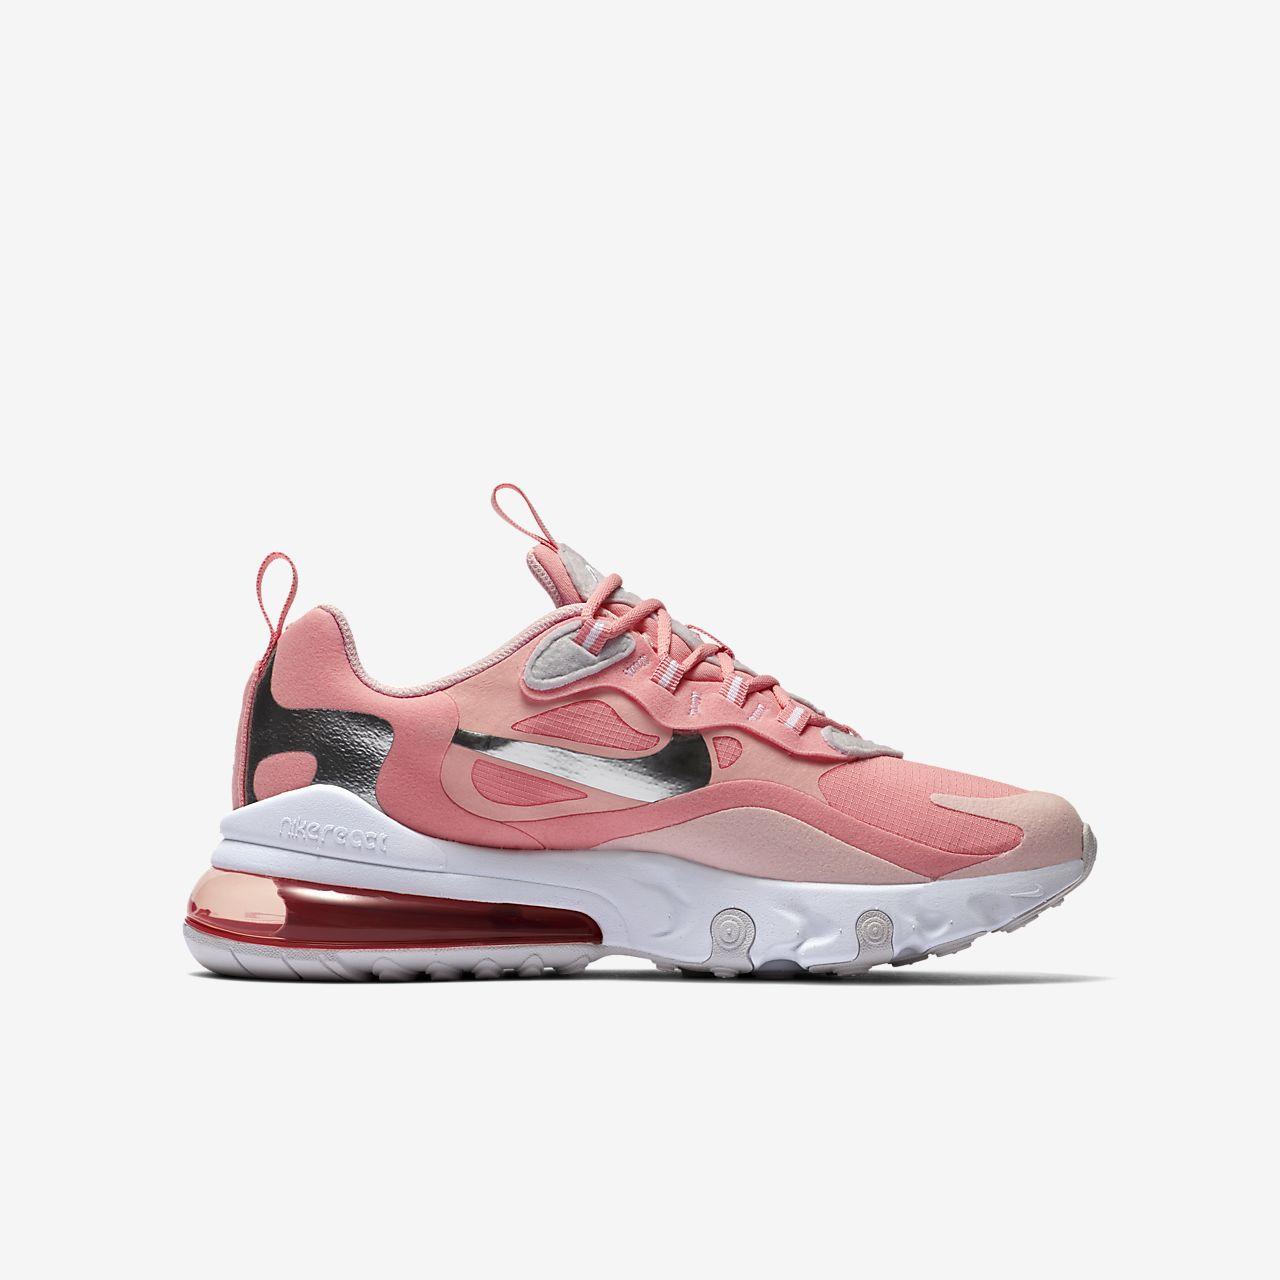 official shop better first look Nike Air Max 270 React Schuh für ältere Kinder